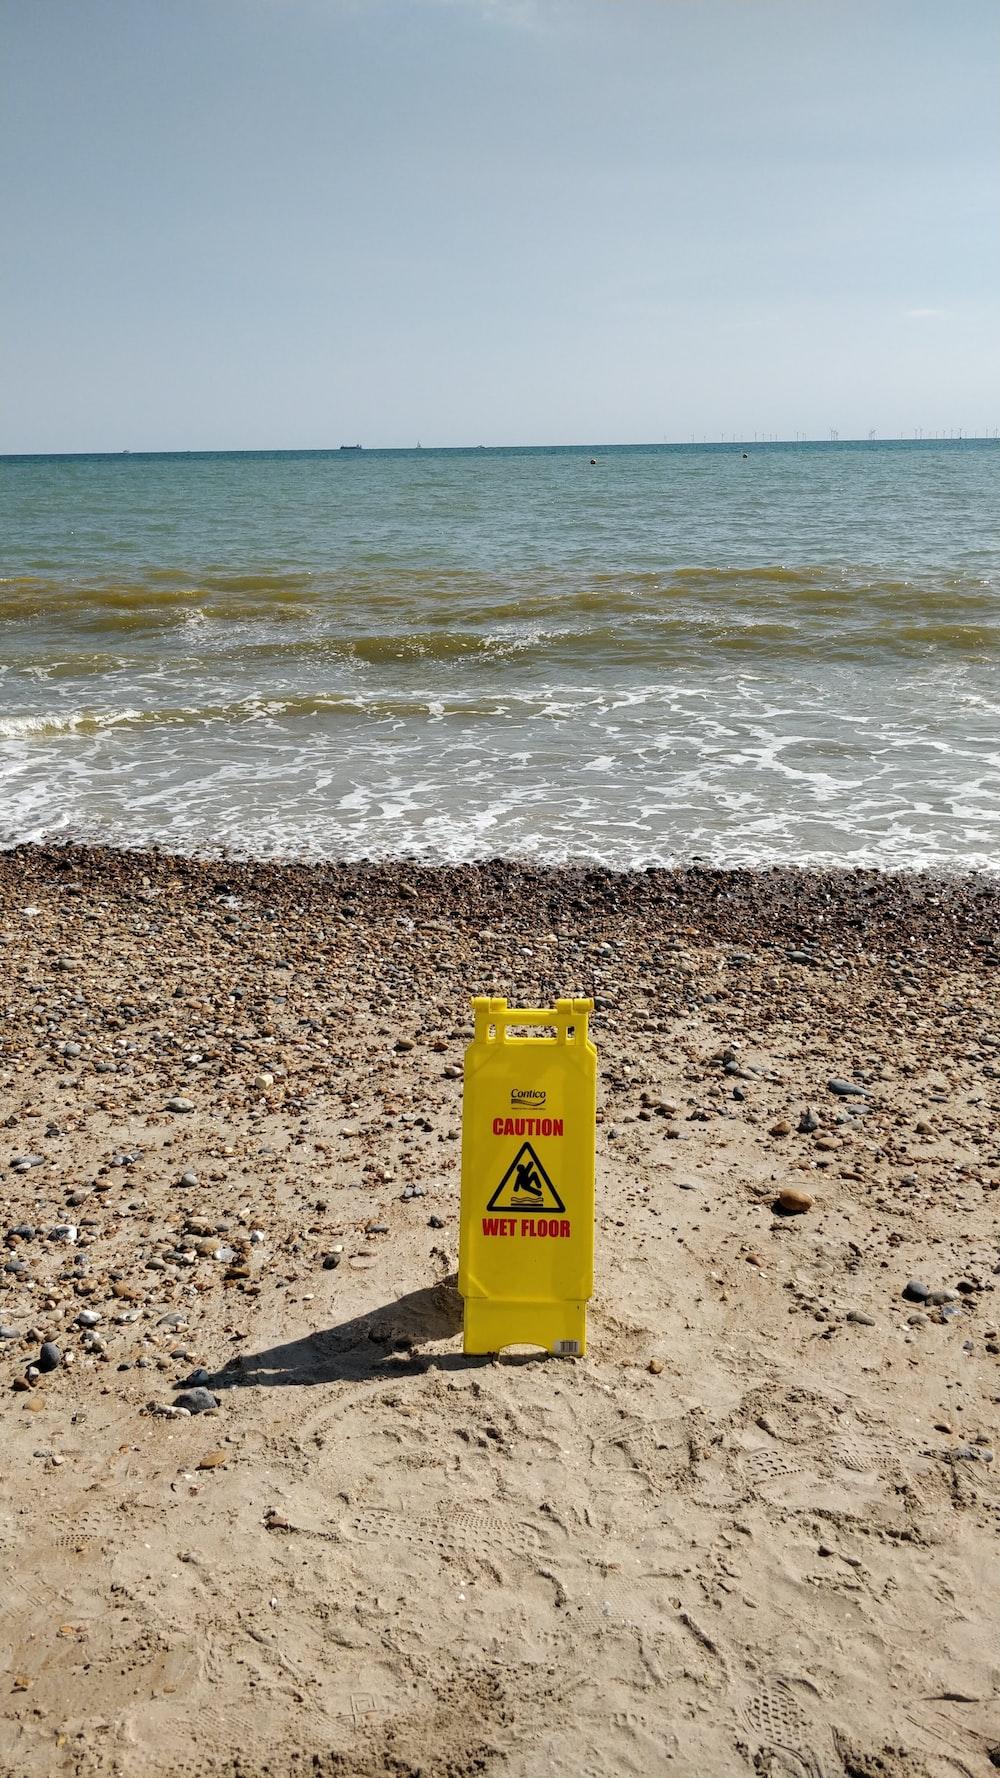 yellow early warning device on the seashore